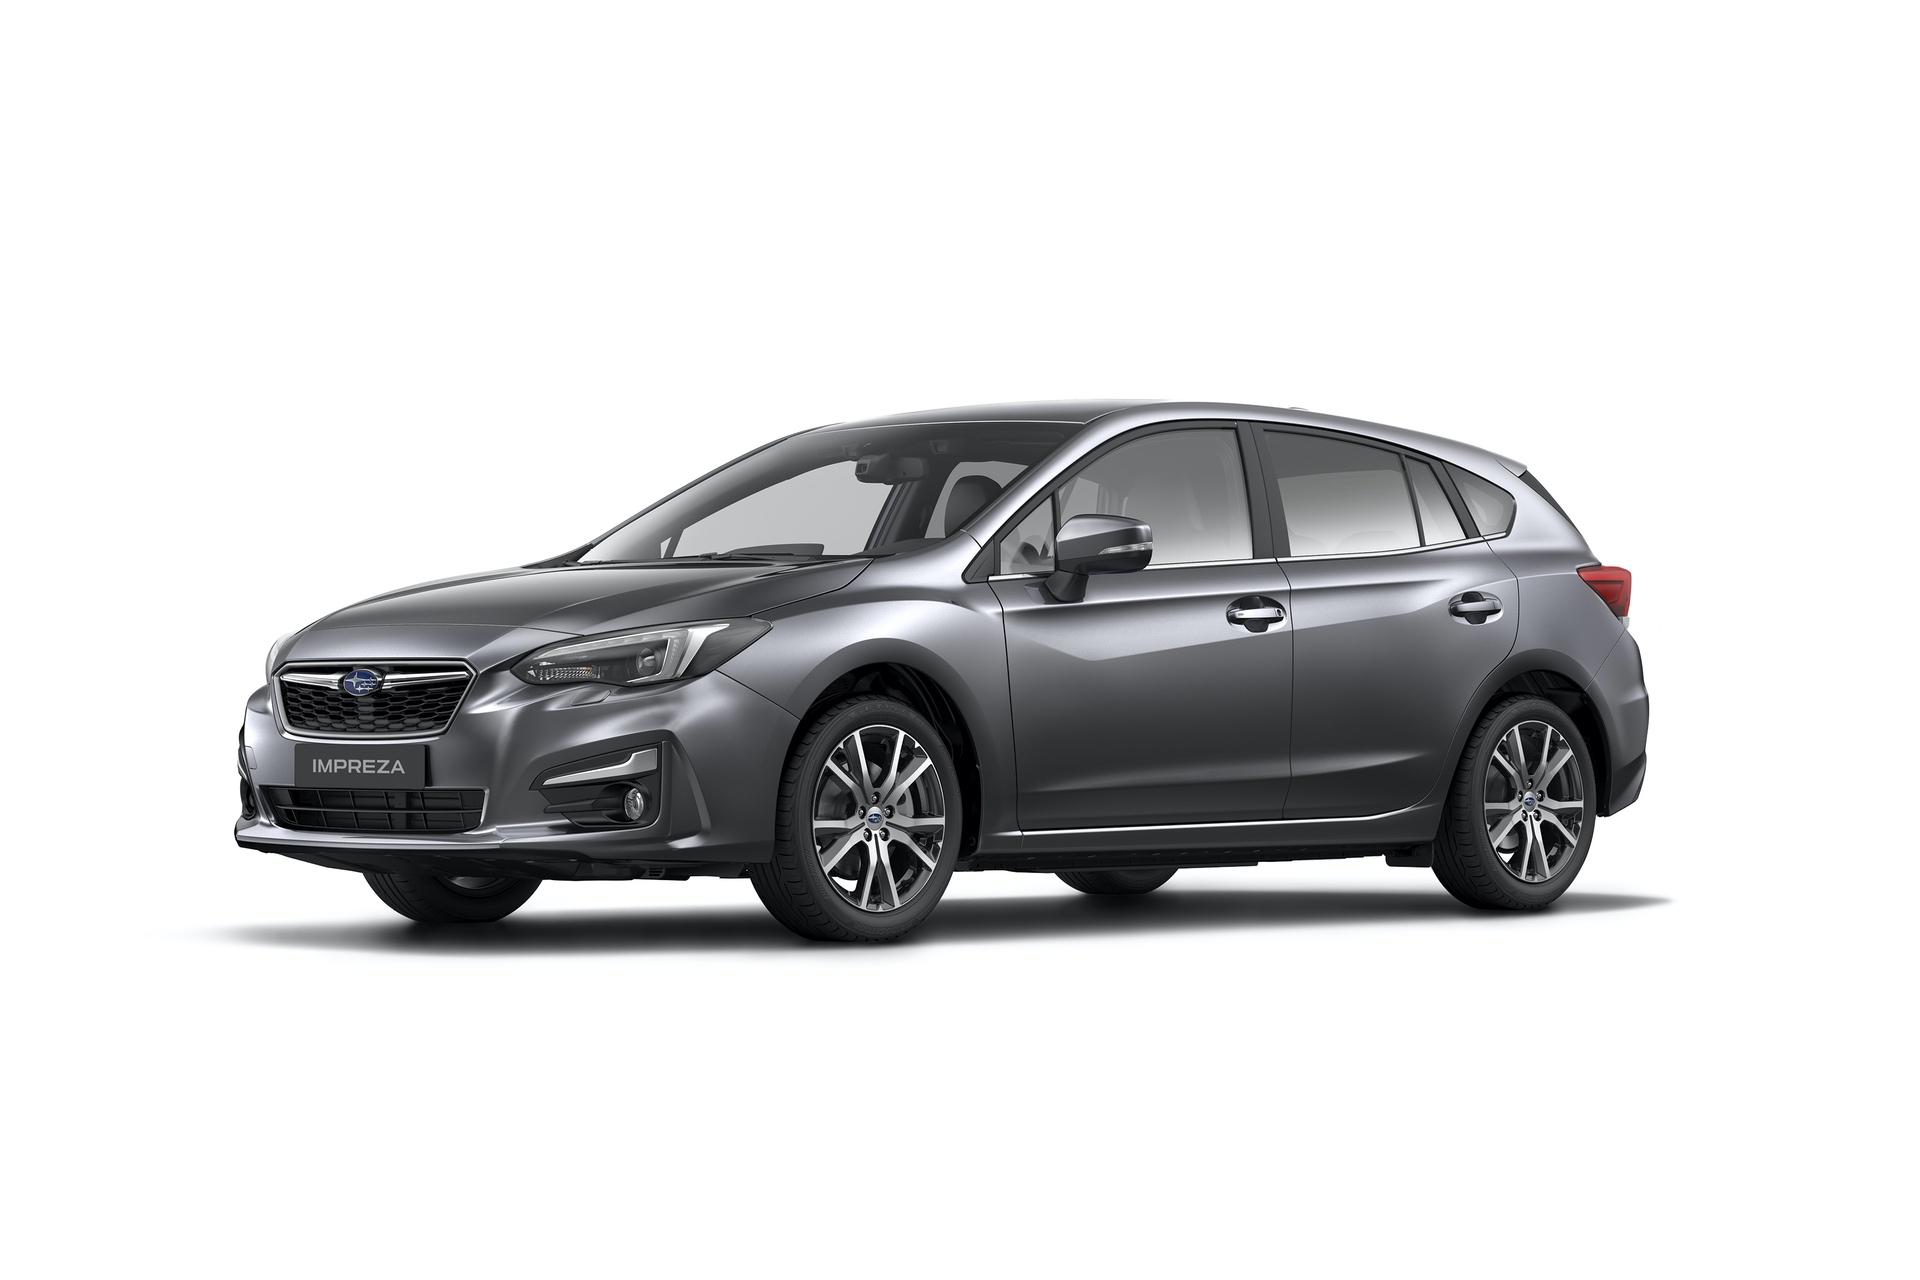 First_Drive_Subaru_Impreza_0008